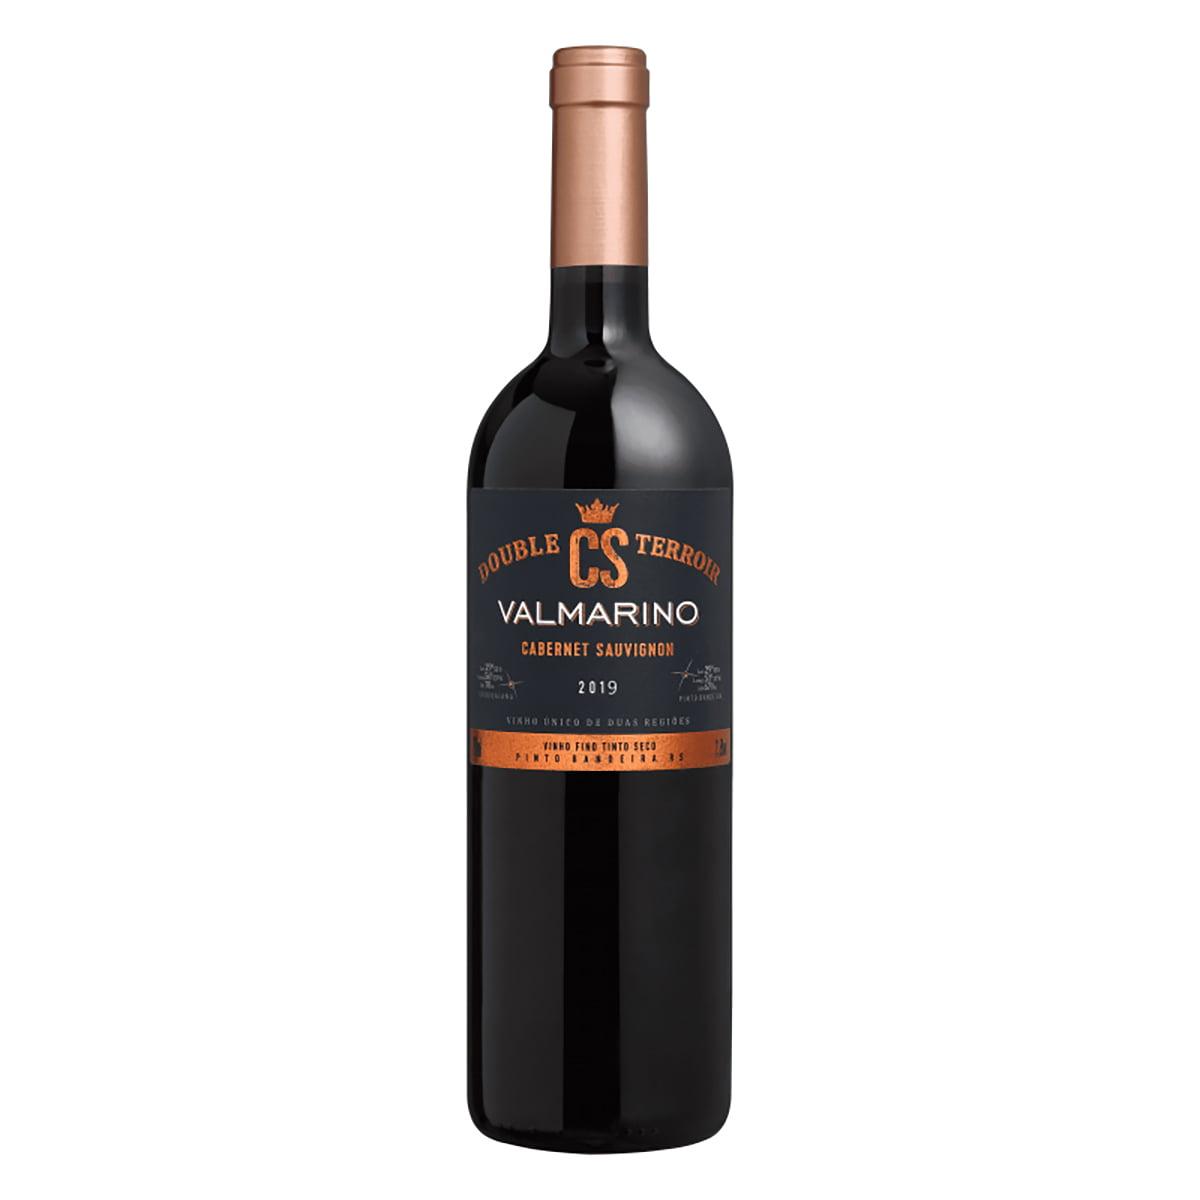 Vinho Valmarino Double Terroir Cabernet Sauvignon Safra 2019 Tinto Seco 750ml